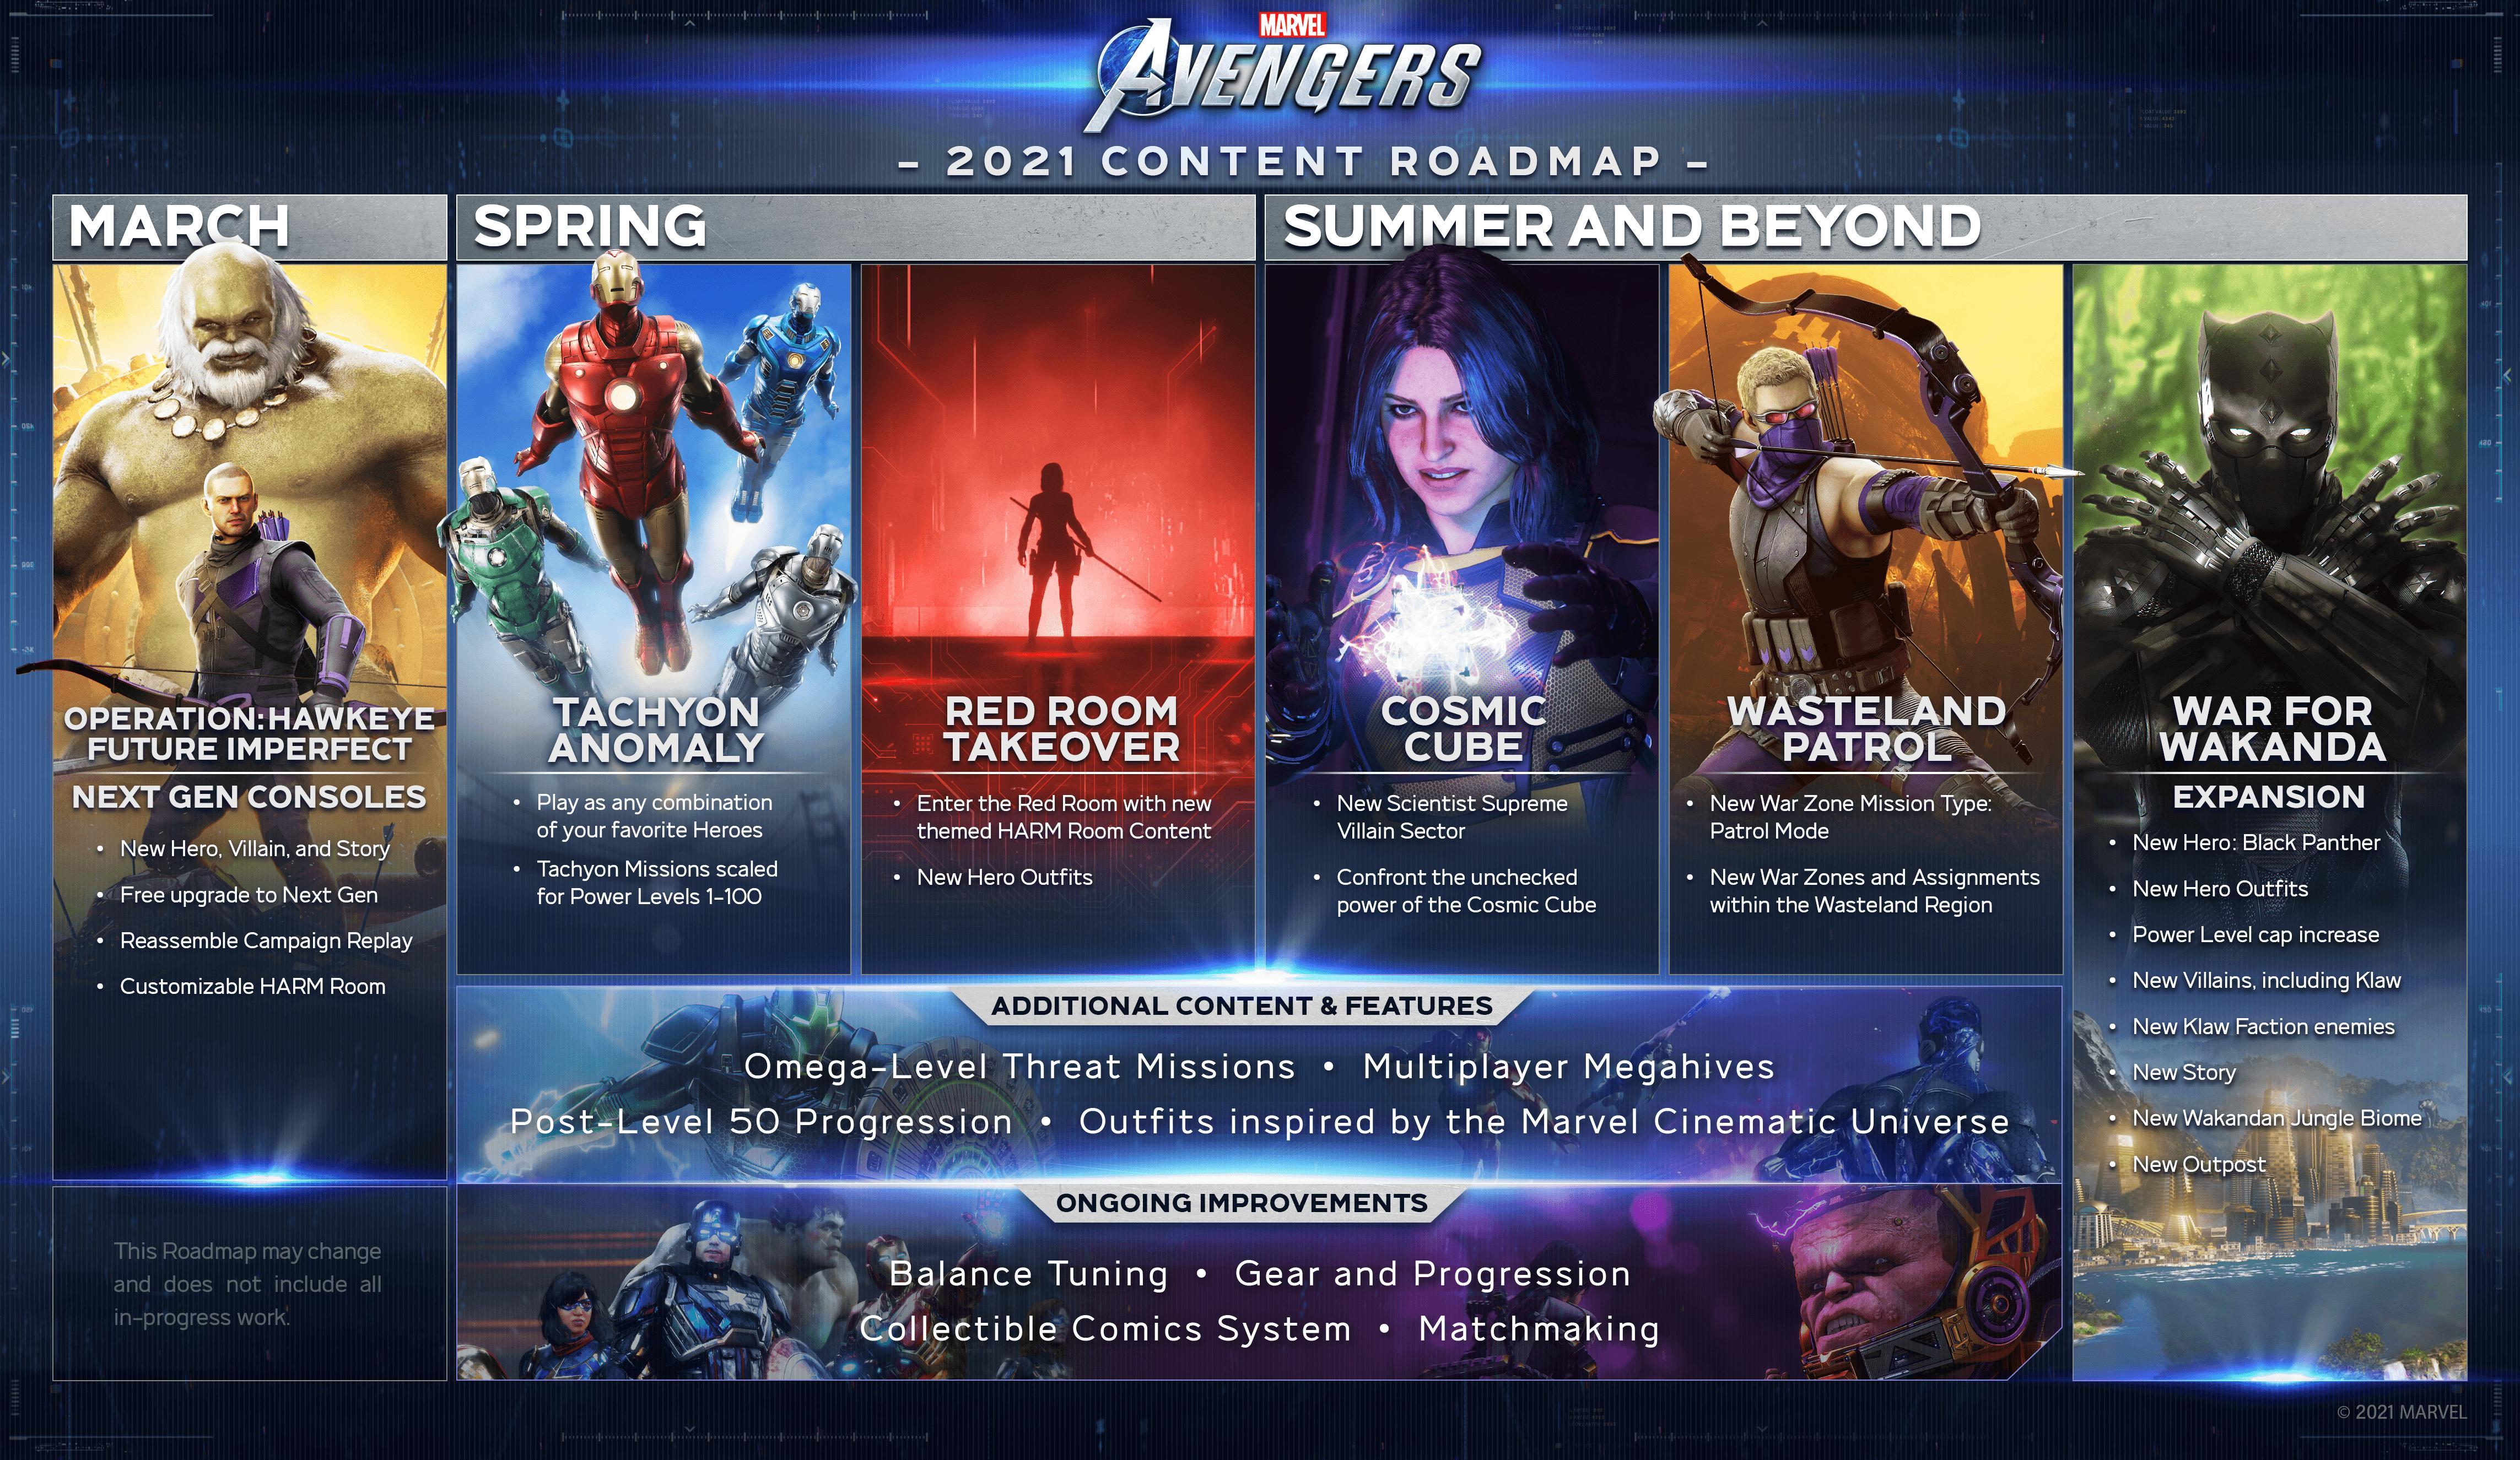 The content roadmap for Marvel's Avengers.